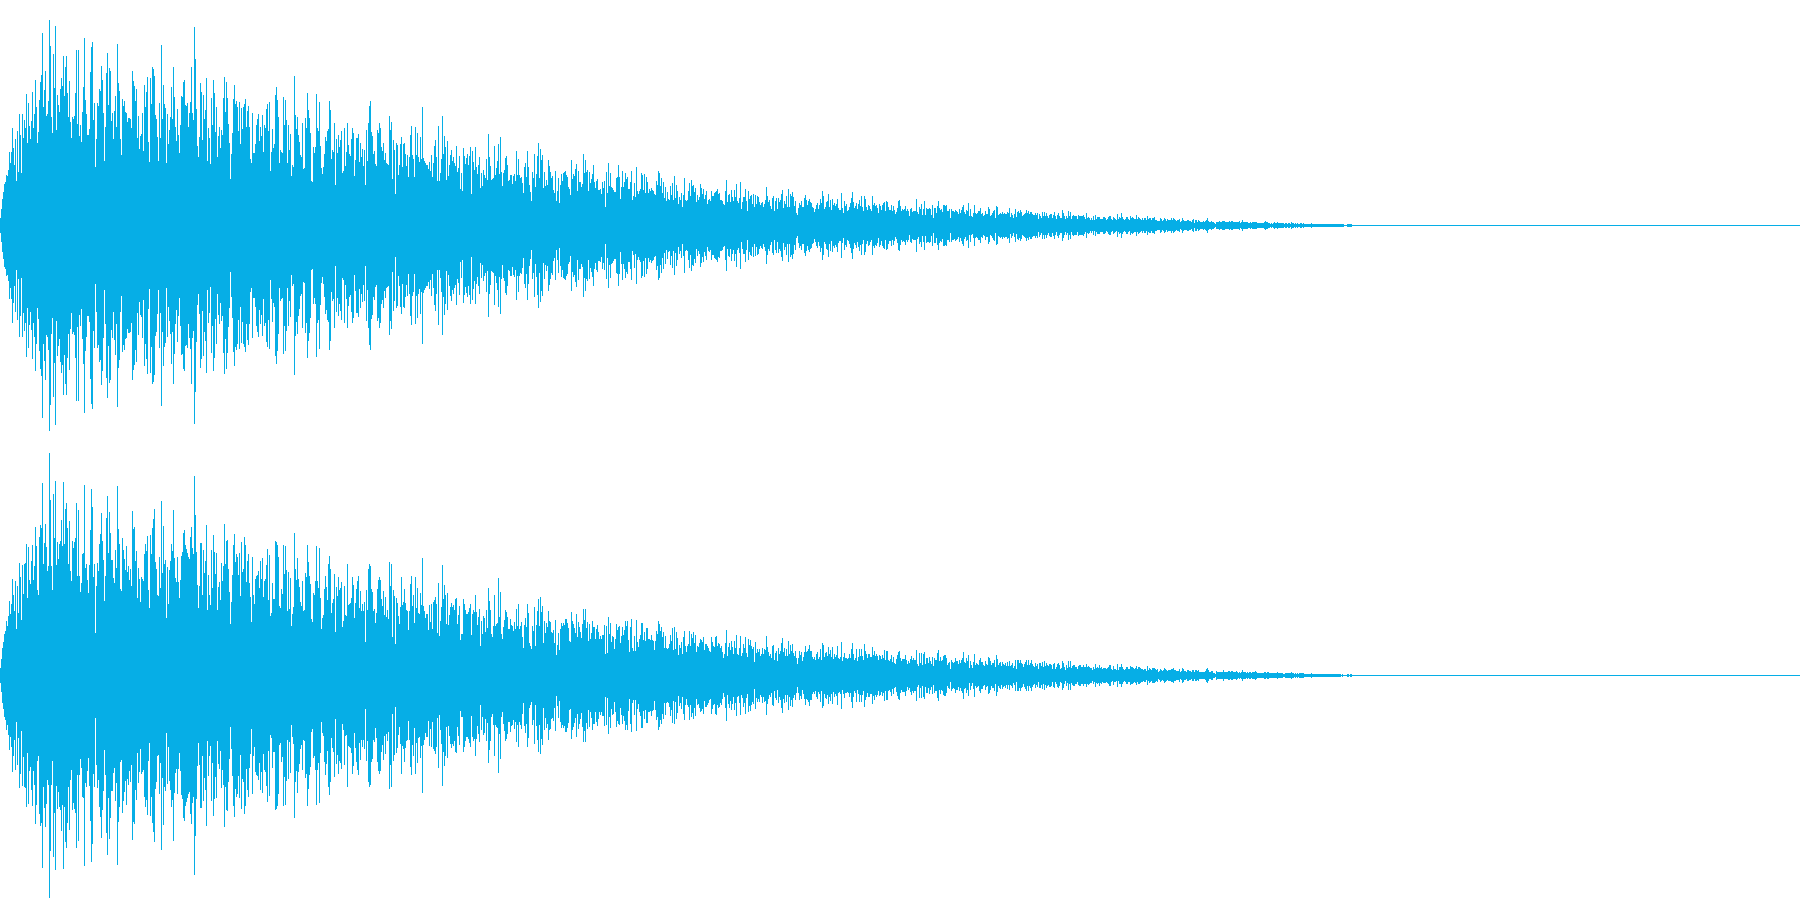 DTM Snare 10 オリジナル音源の再生済みの波形